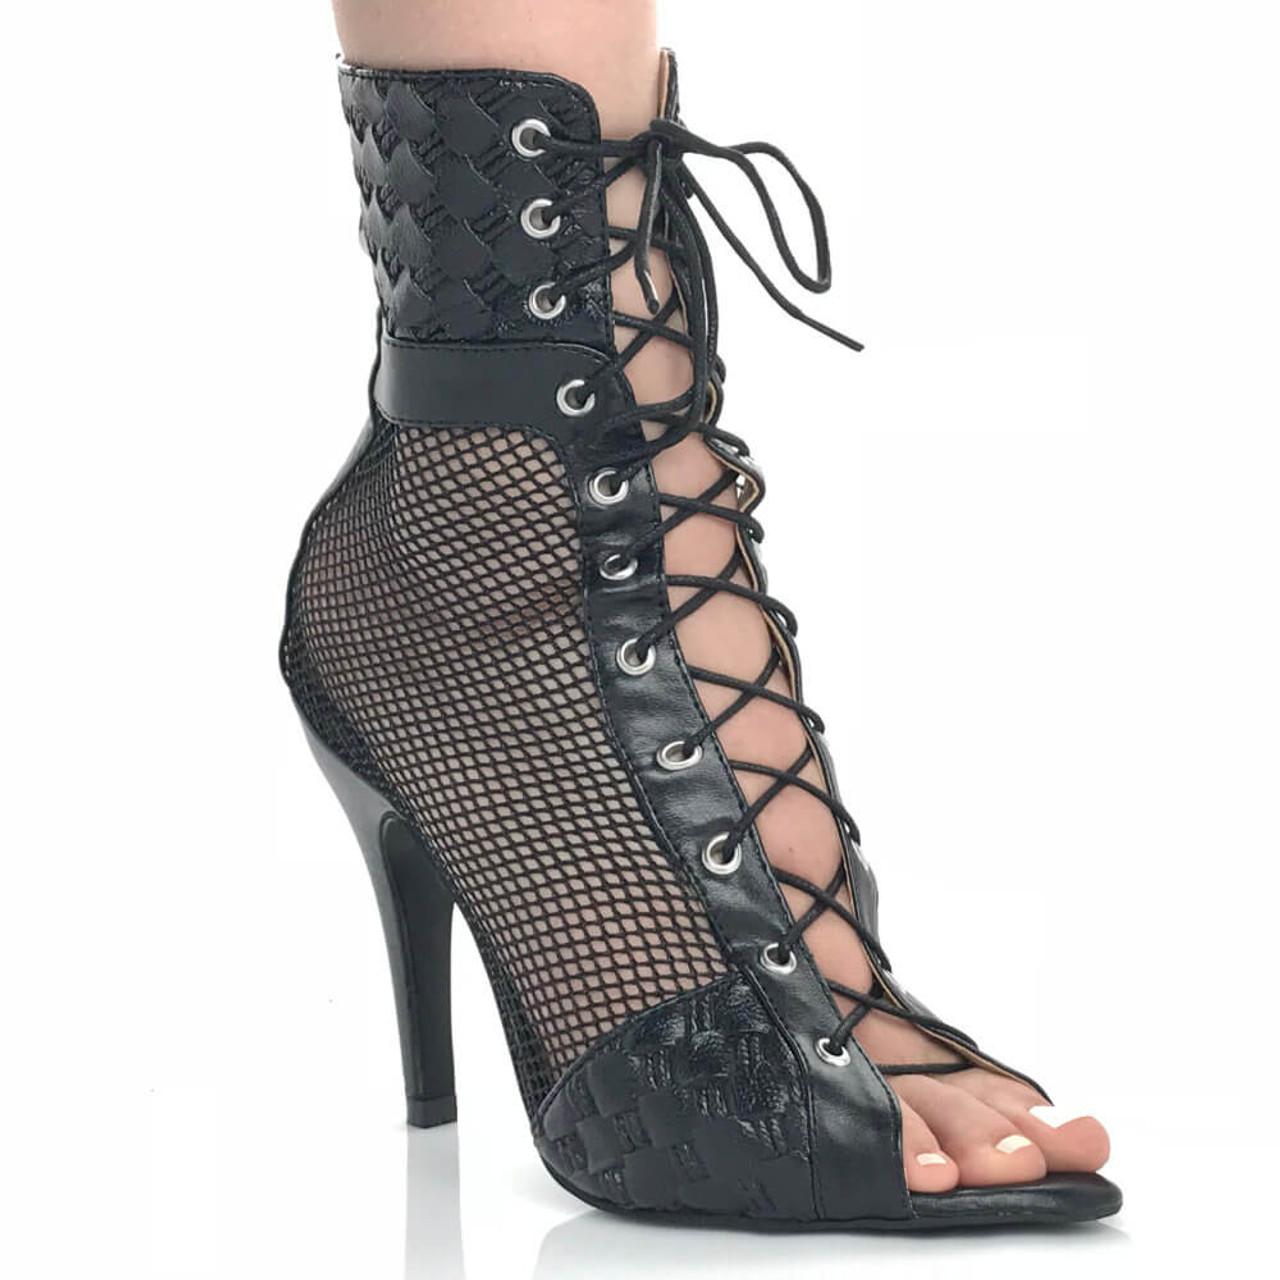 Bootie Lace Up Heels